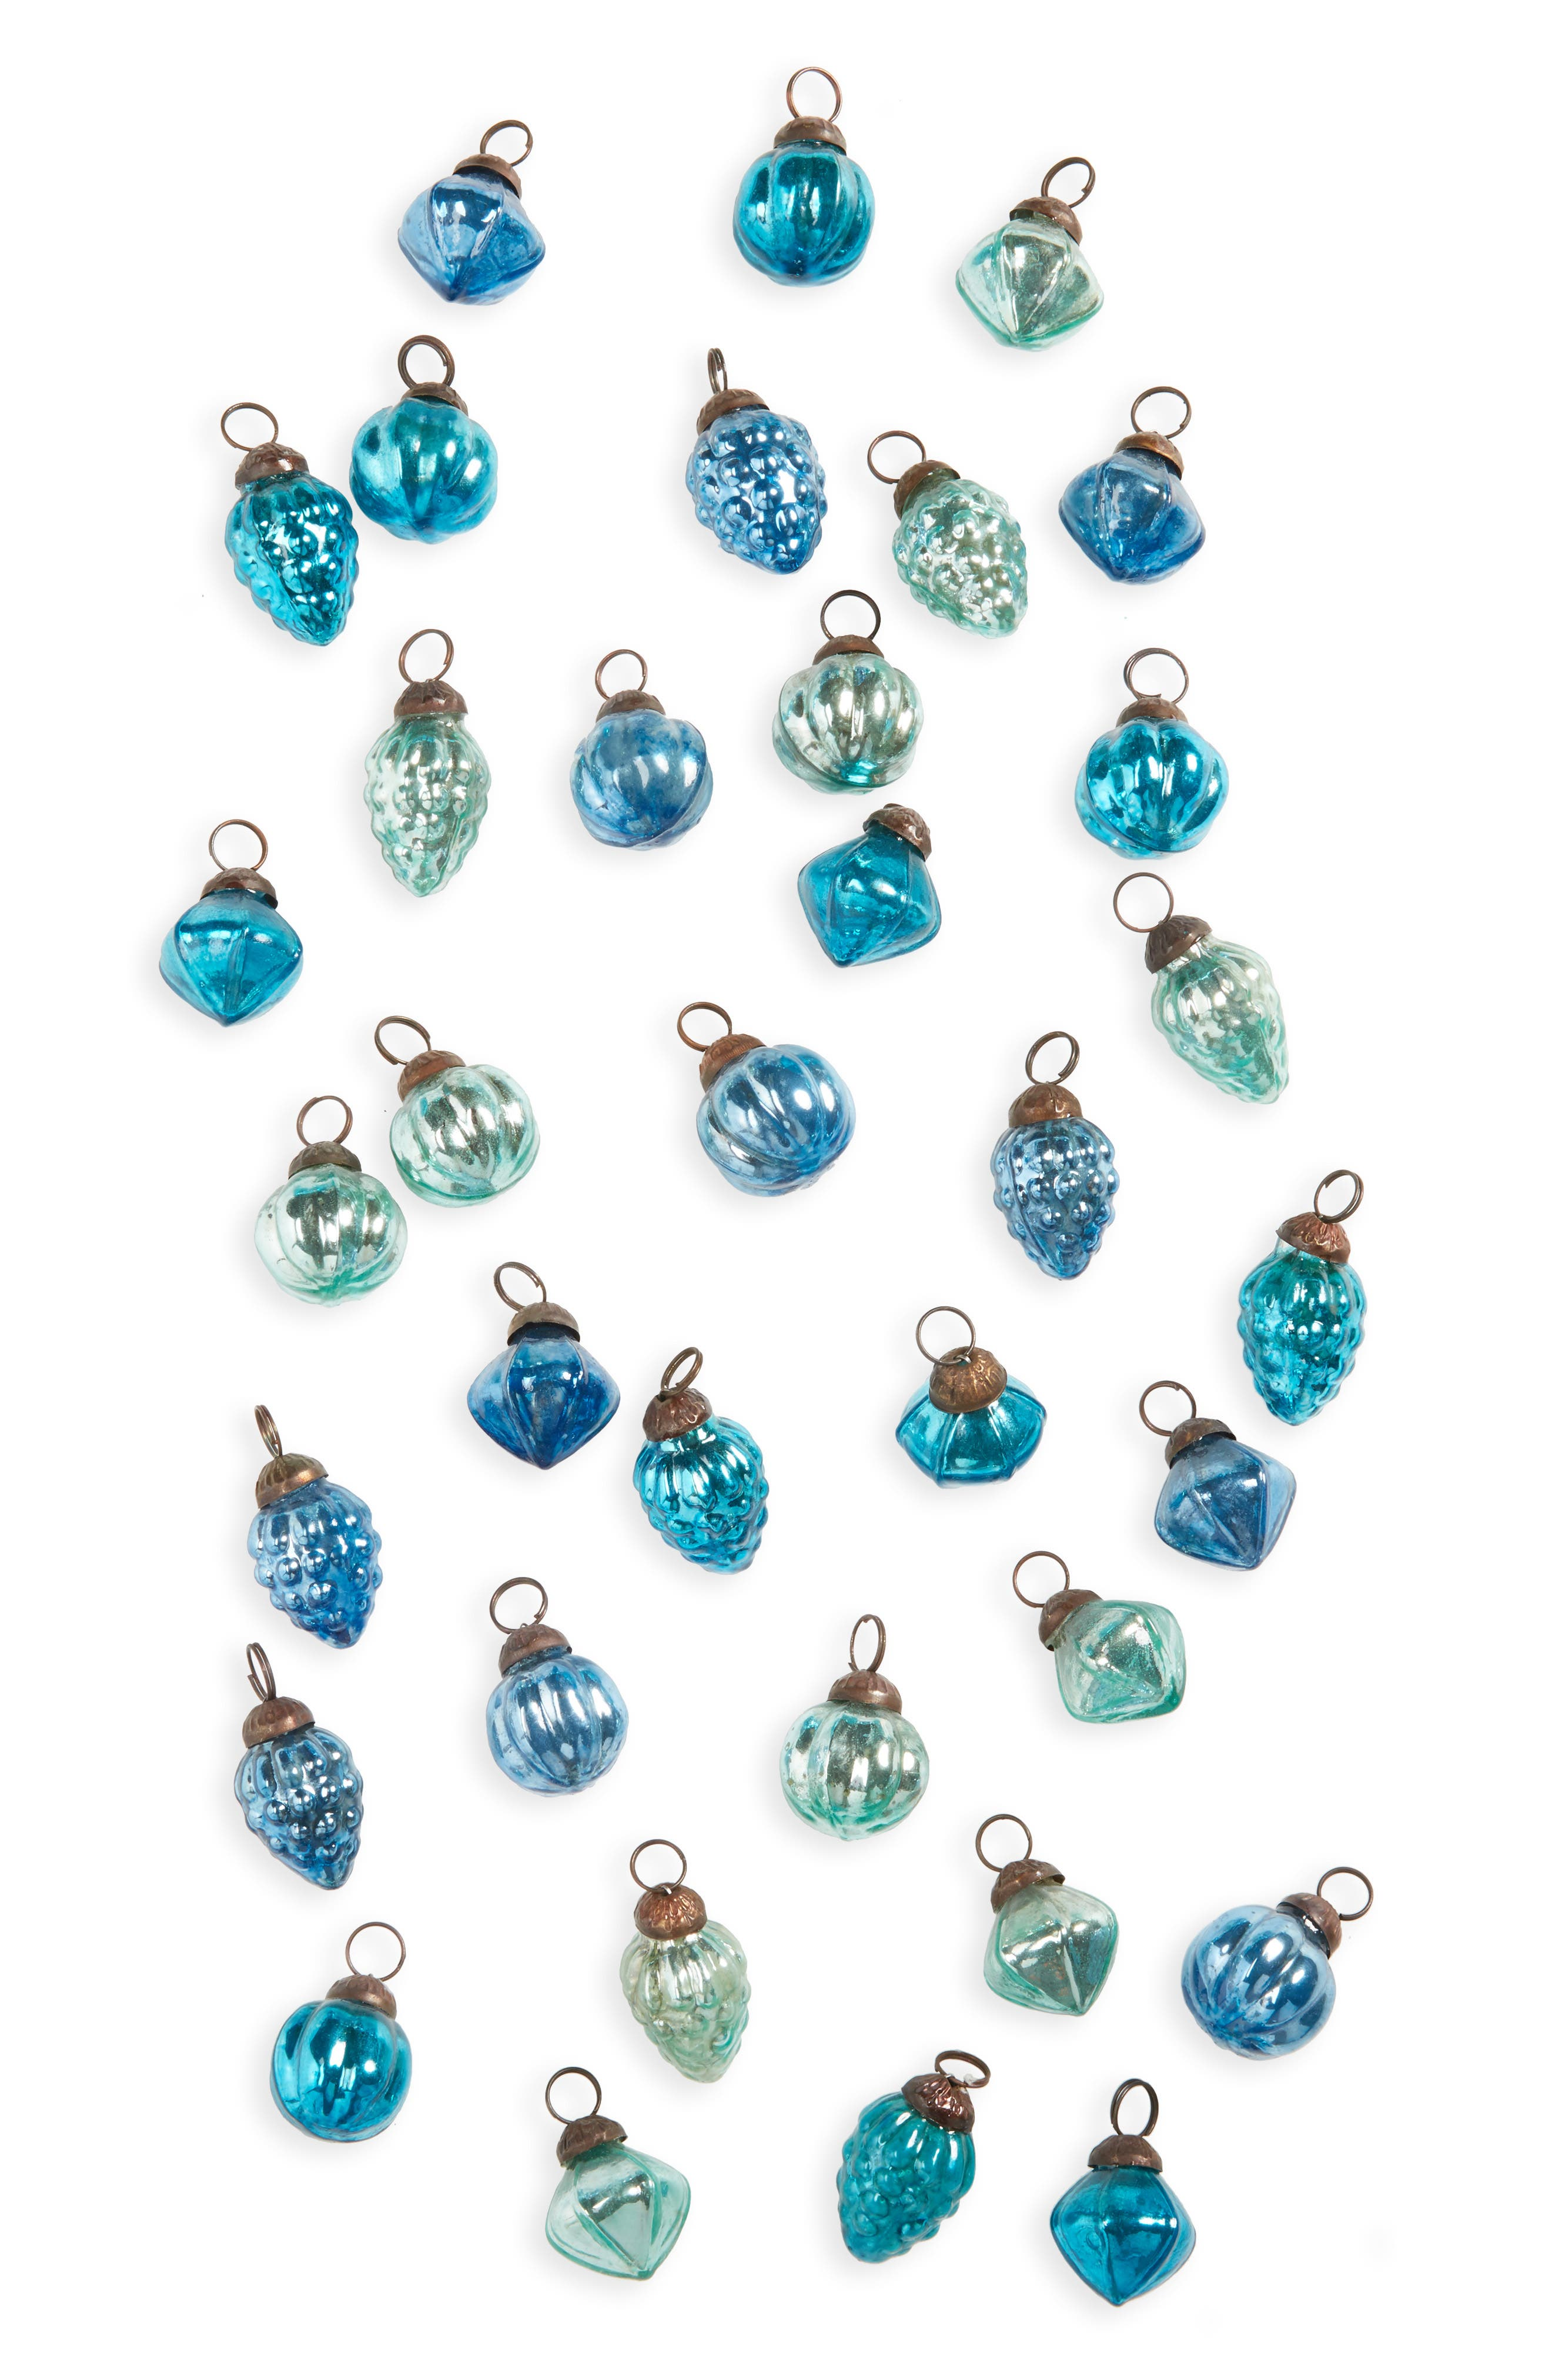 Creative Co-Op Set of 36 Mercury Glass Ornaments